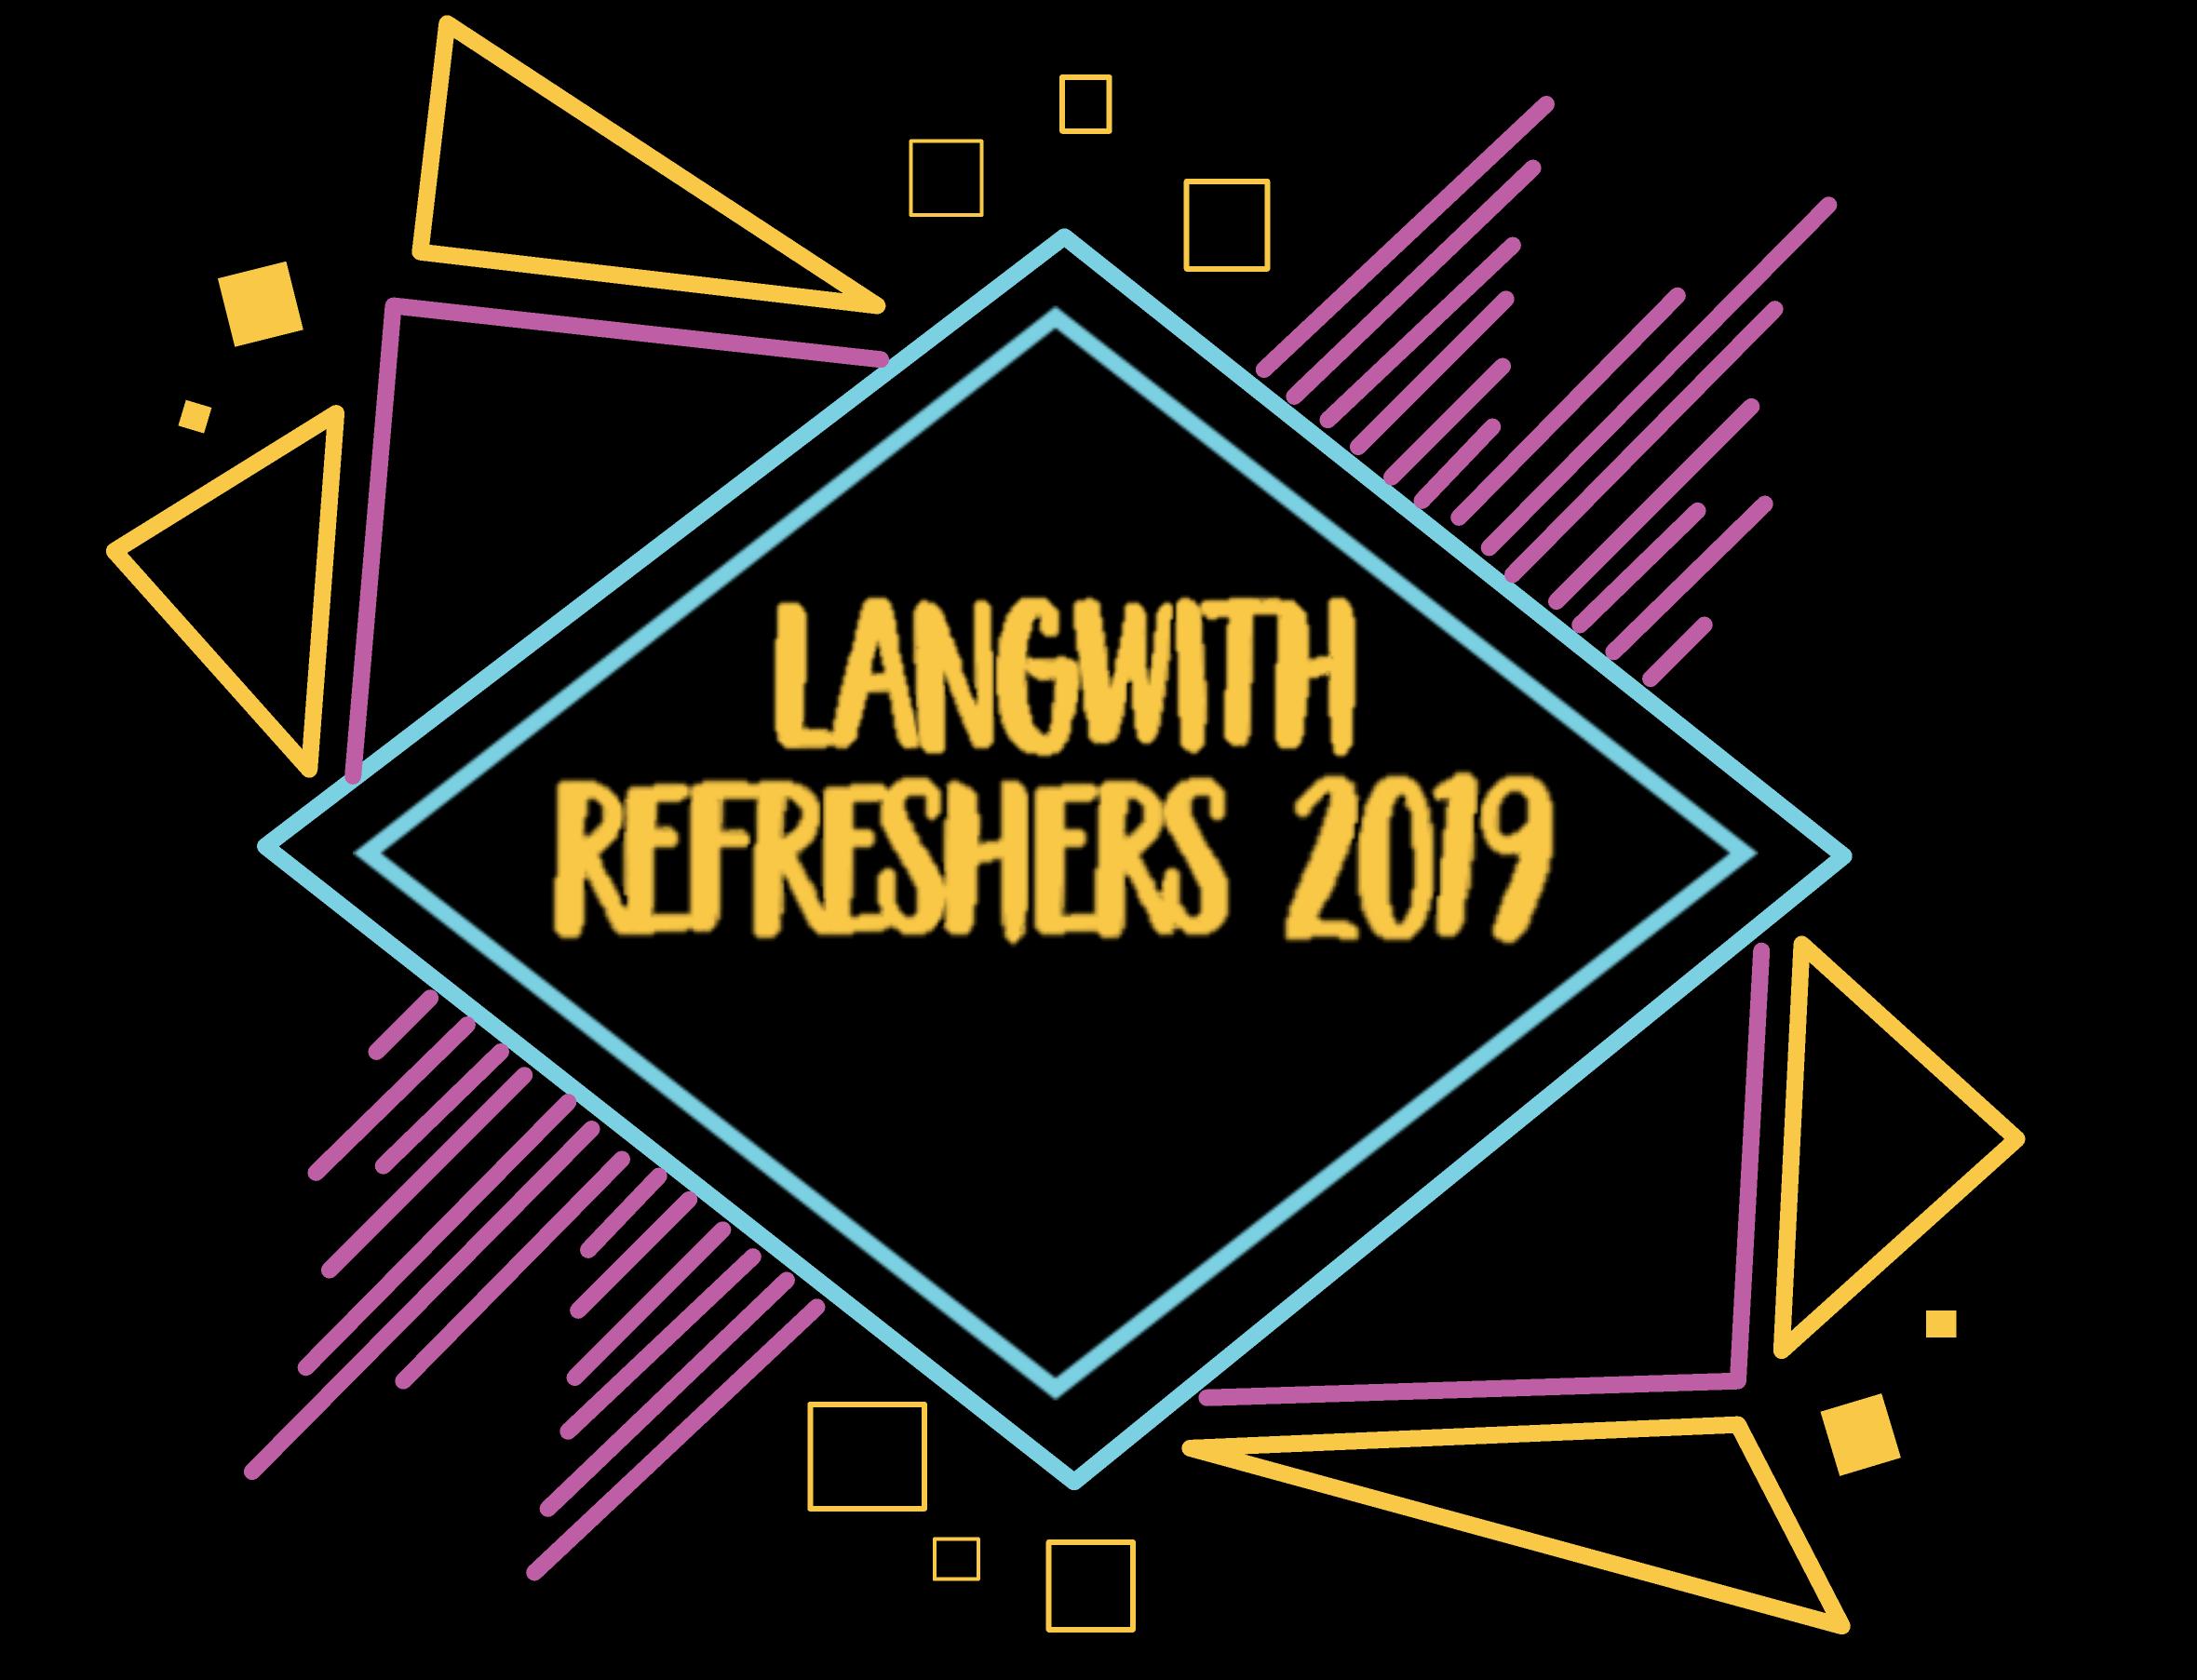 REFRESHERS 2019